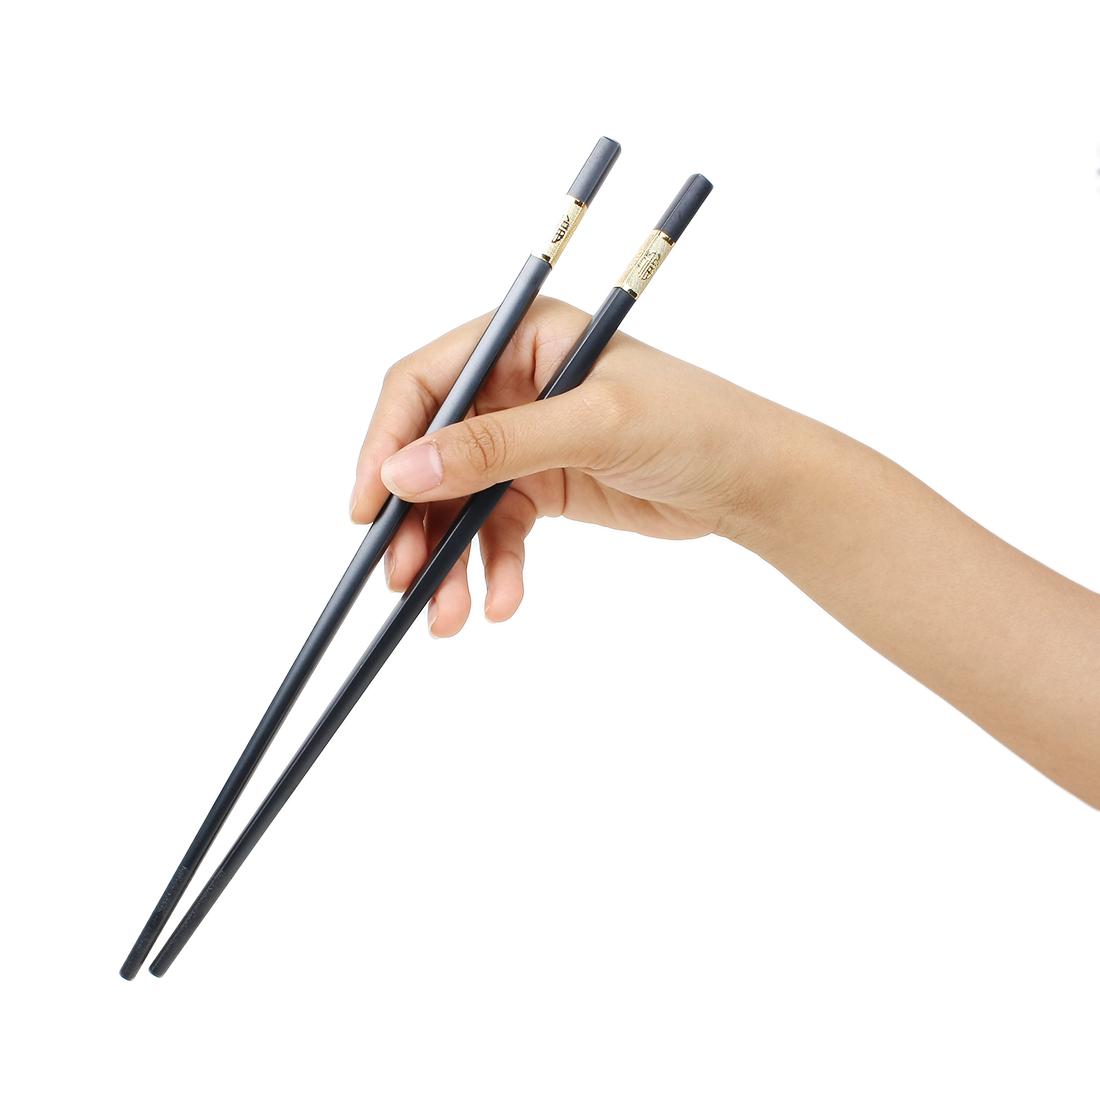 Casa-J Plastic Chinese Character Fu Printed Chopsticks Pair Black Gold Tone